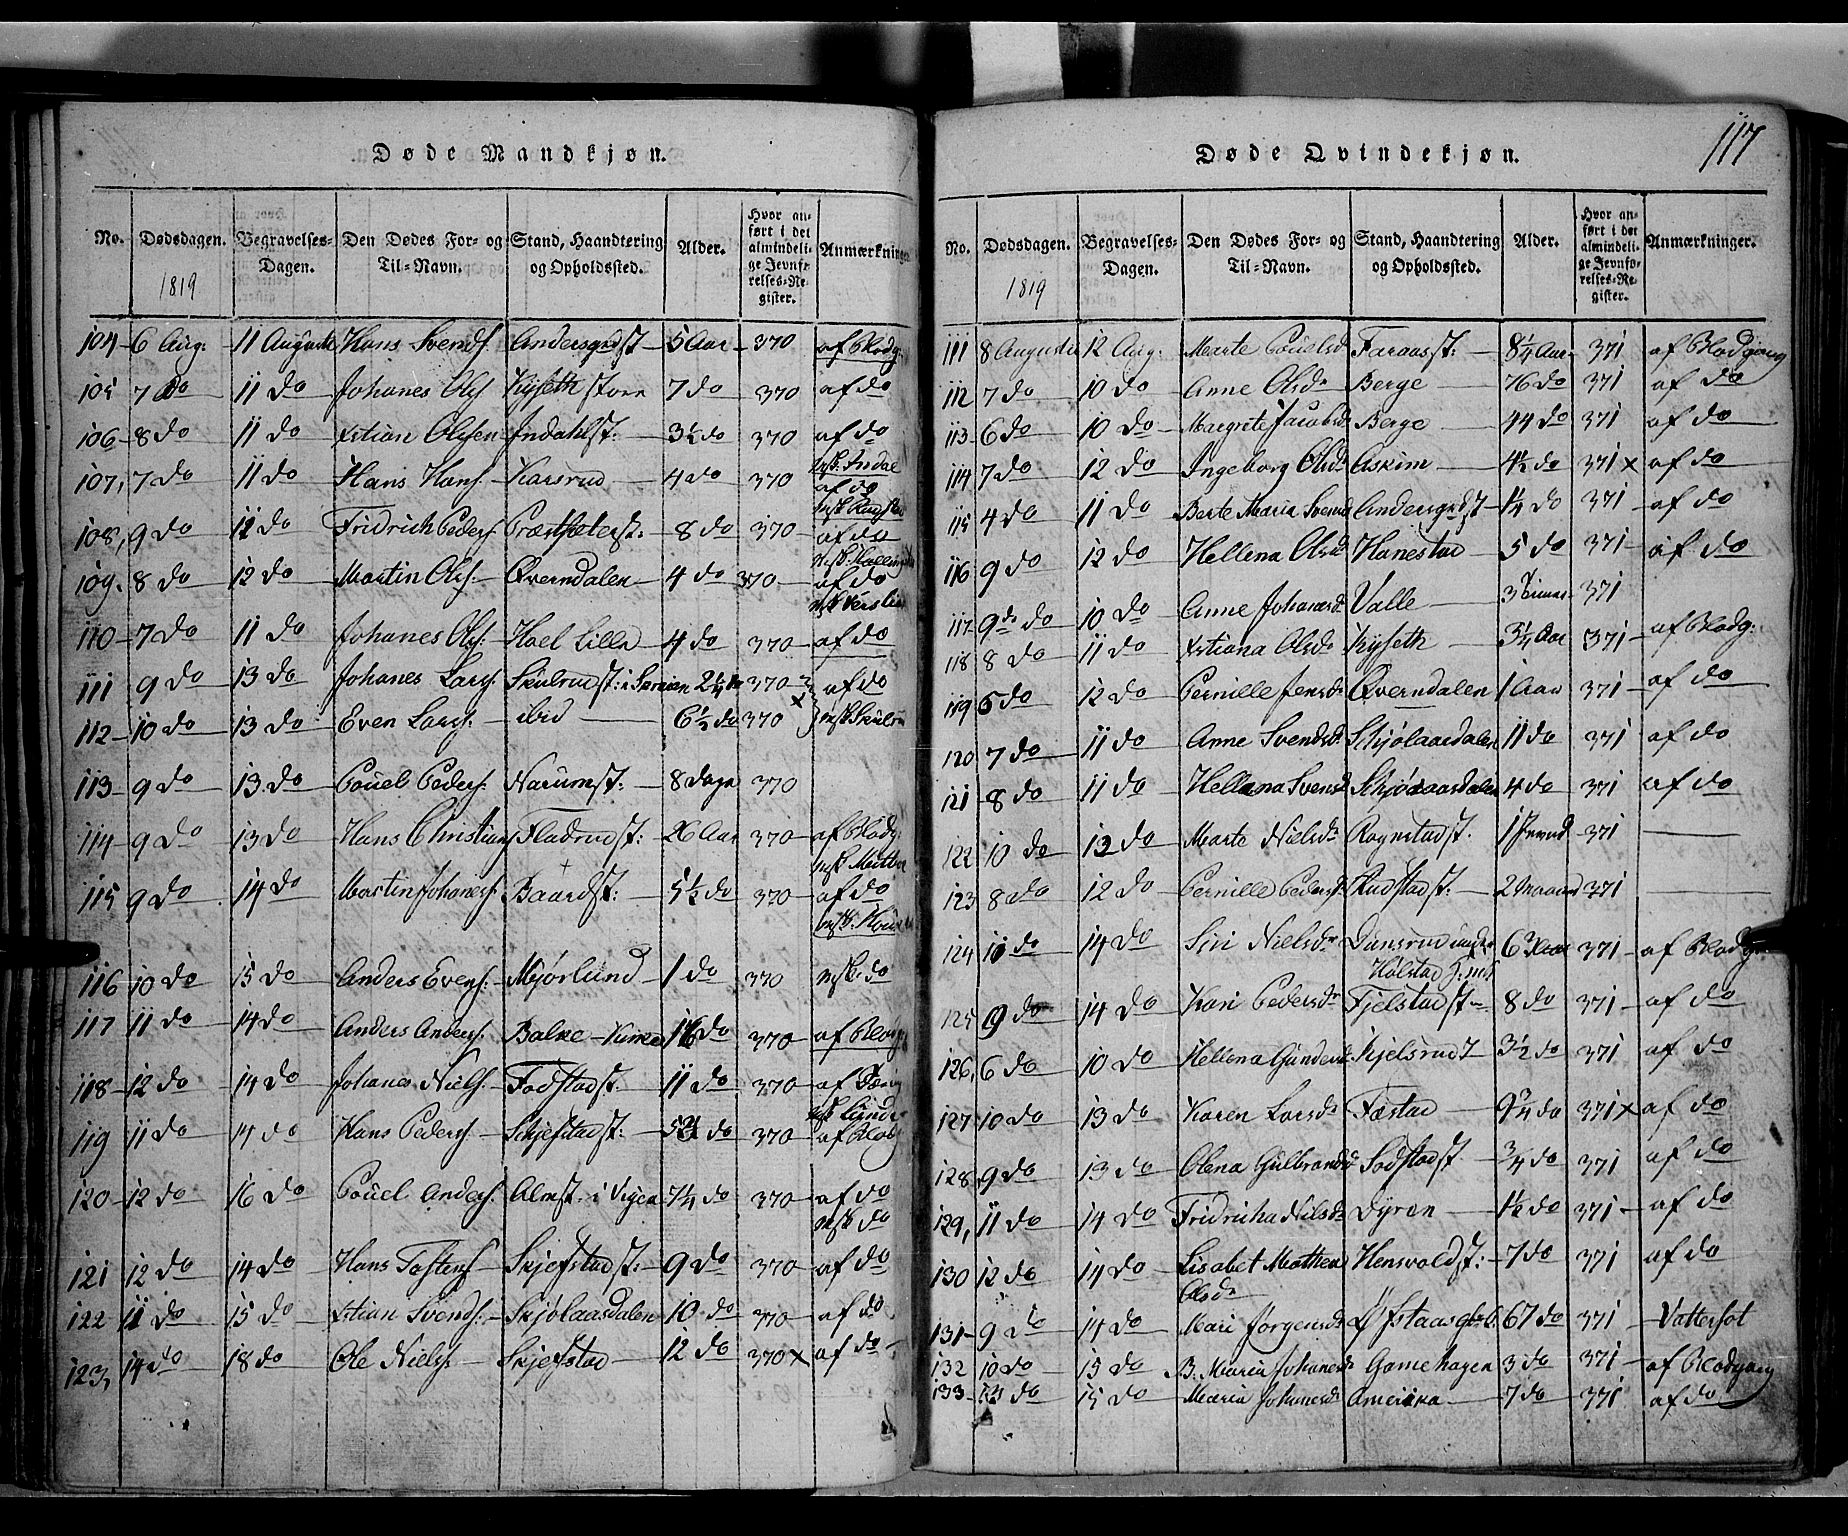 SAH, Toten prestekontor, Klokkerbok nr. 1, 1814-1820, s. 117